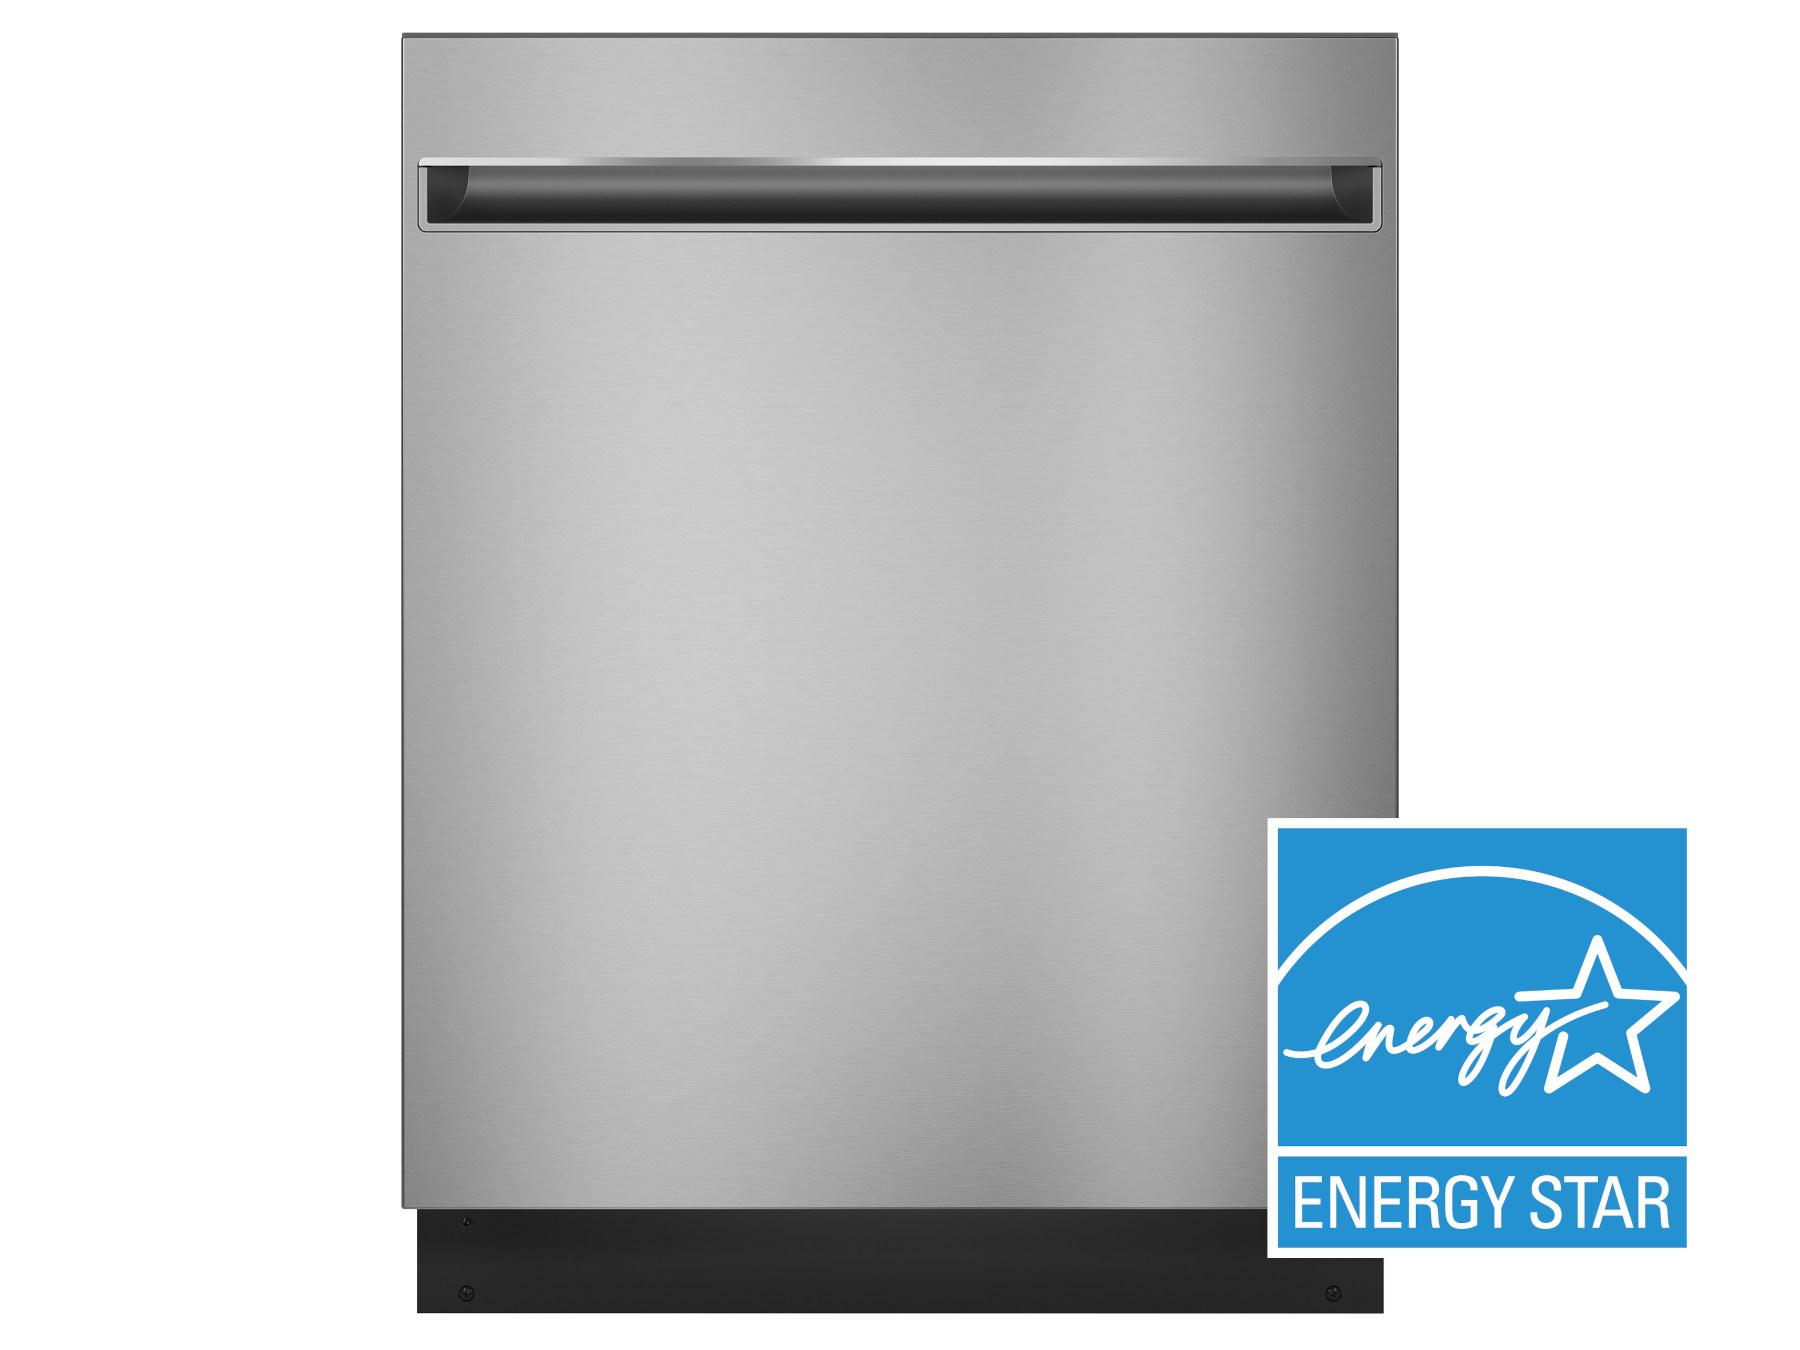 24434 – Stainless Steel Dishwasher – G-GDT225SSLSS – Front